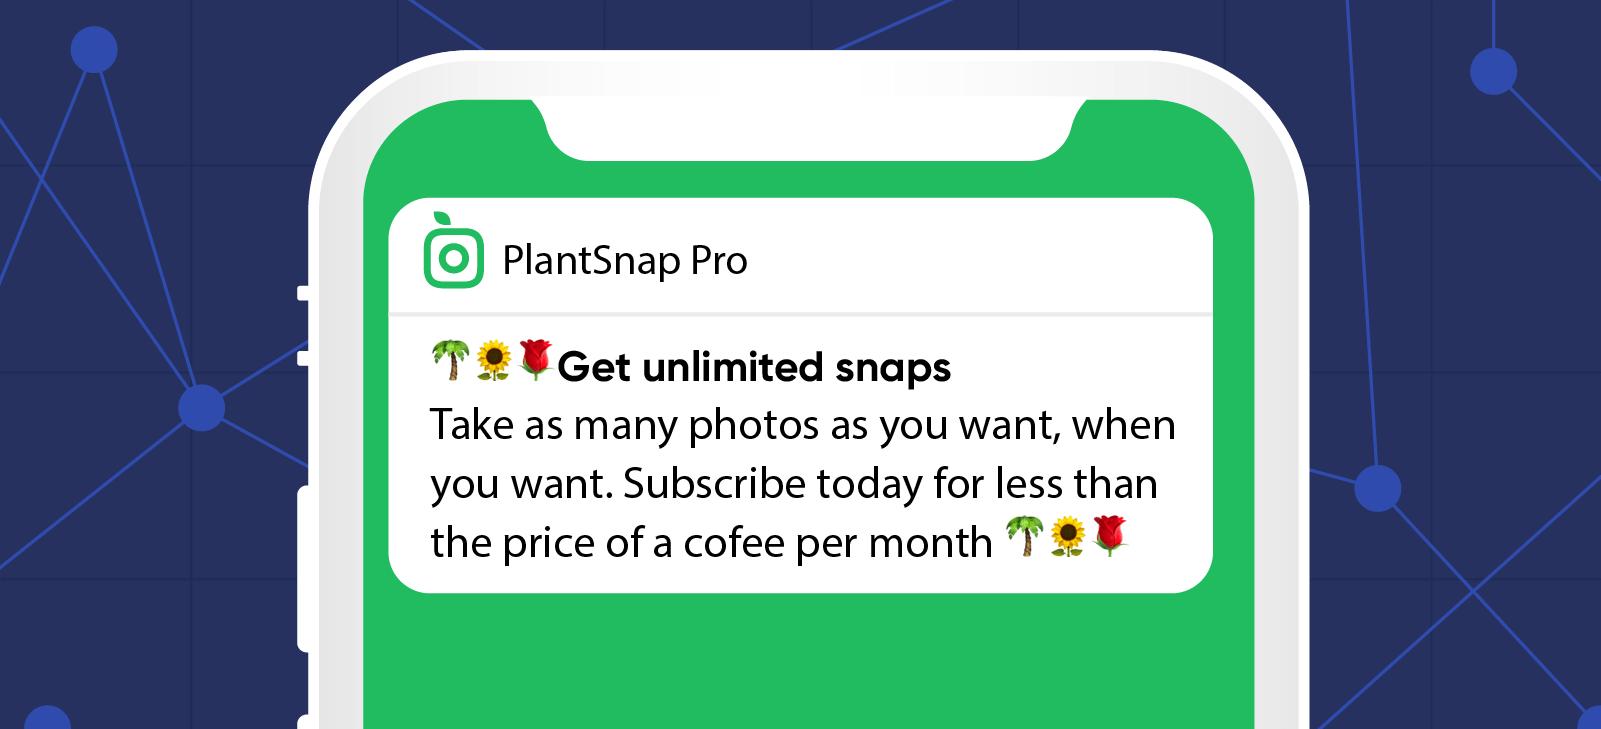 CleverTap PlantSnap partnership